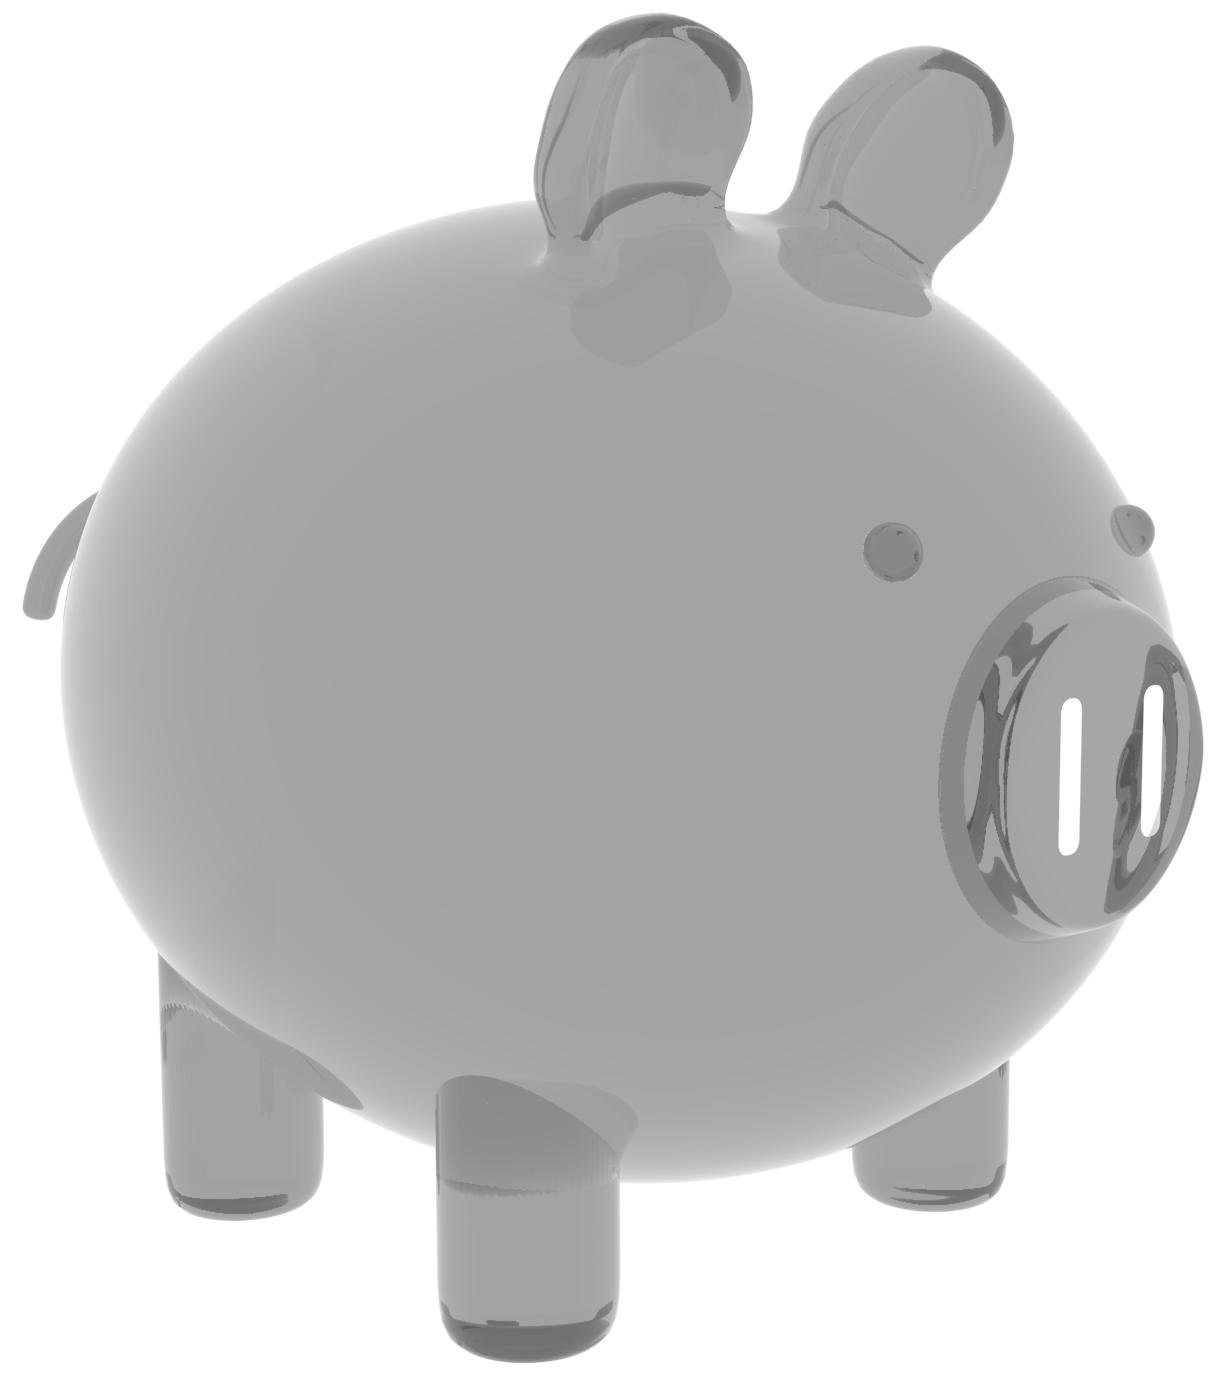 Money box clipart vector free stock Pig Moneybox Png Clipart Picture - ClipartlyClipartly vector free stock